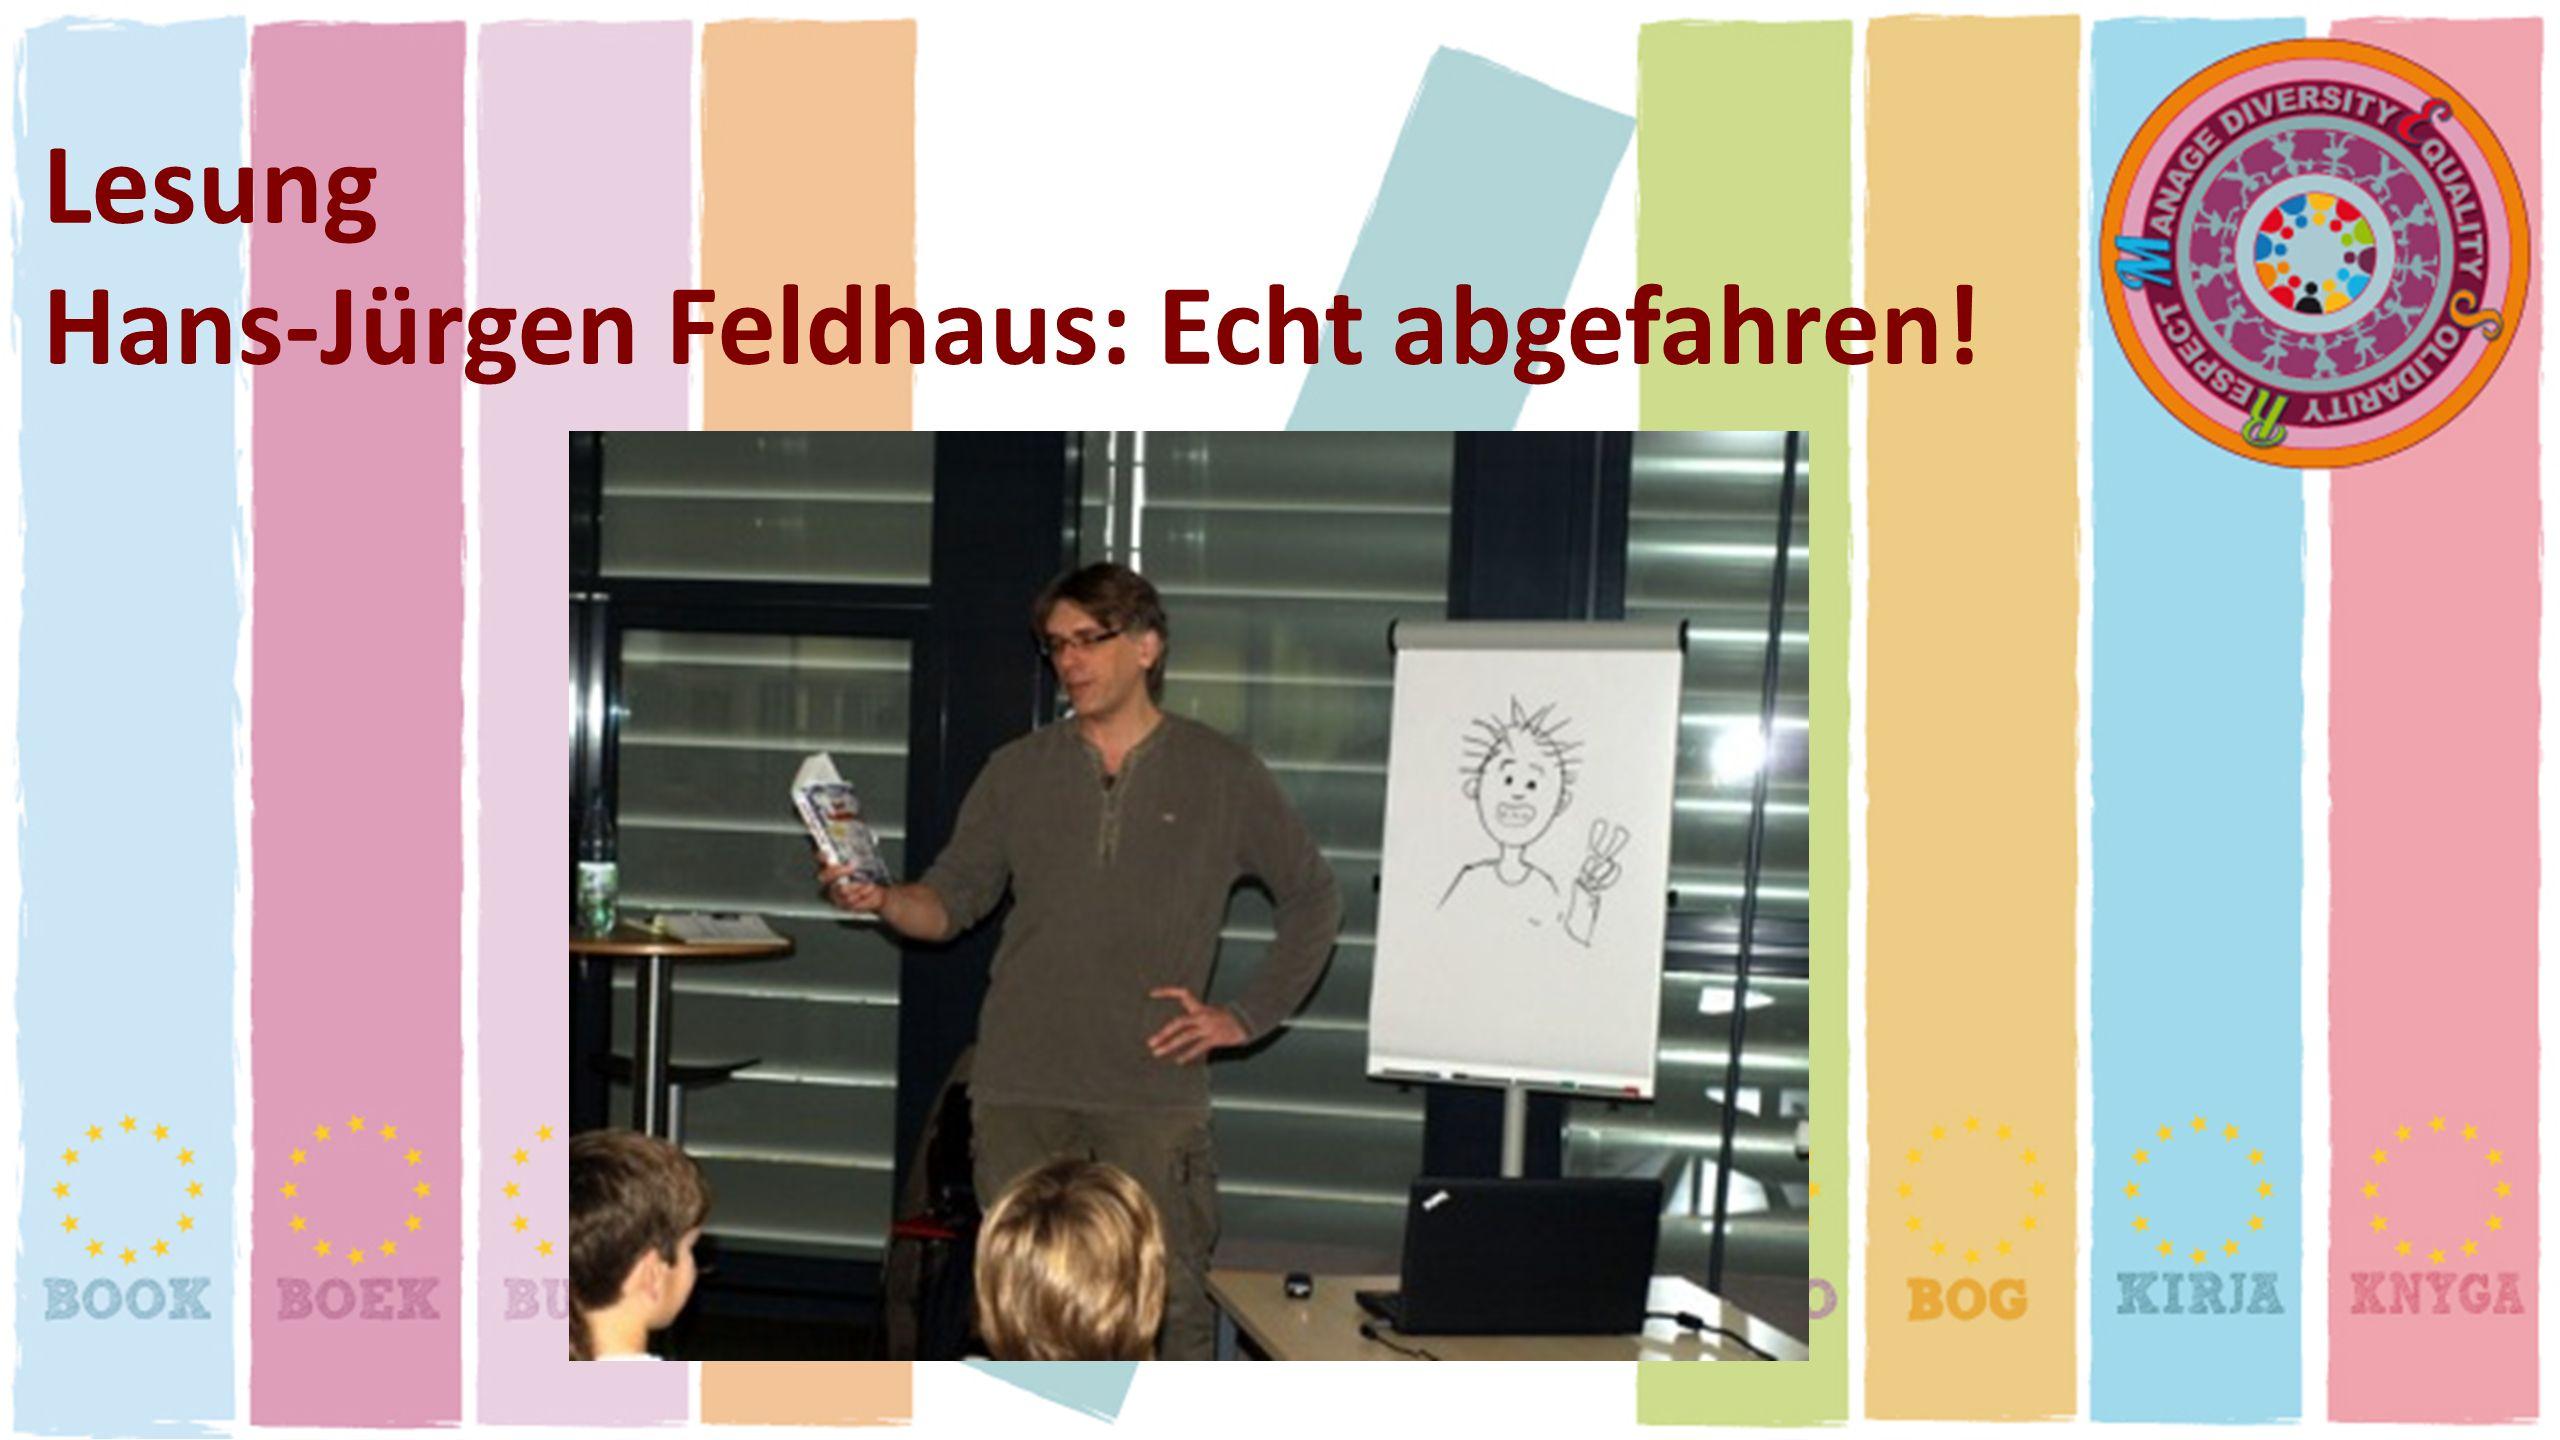 Lesung Hans-Jürgen Feldhaus: Echt abgefahren!